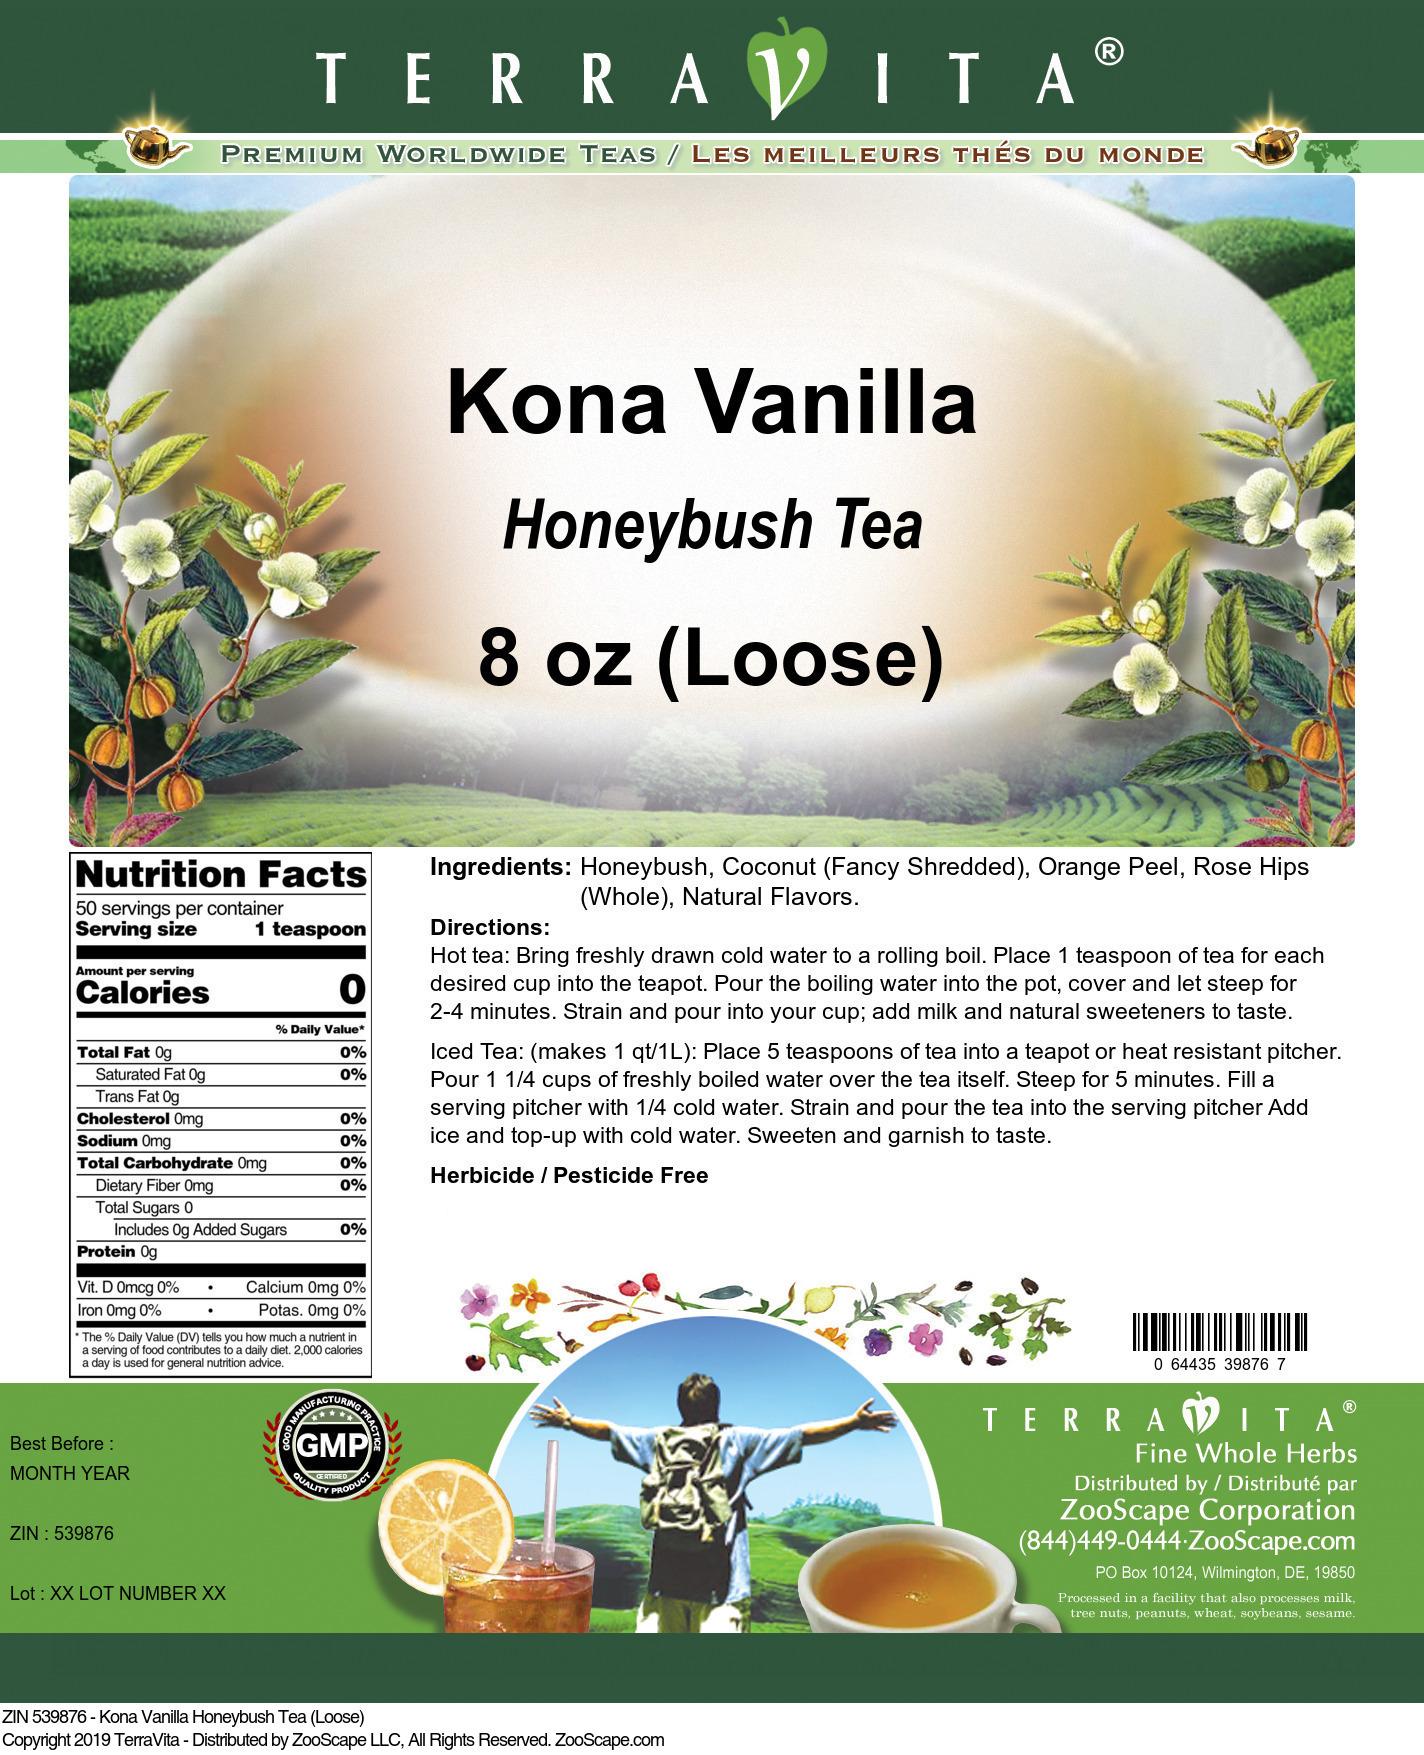 Kona Vanilla Honeybush Tea (Loose)